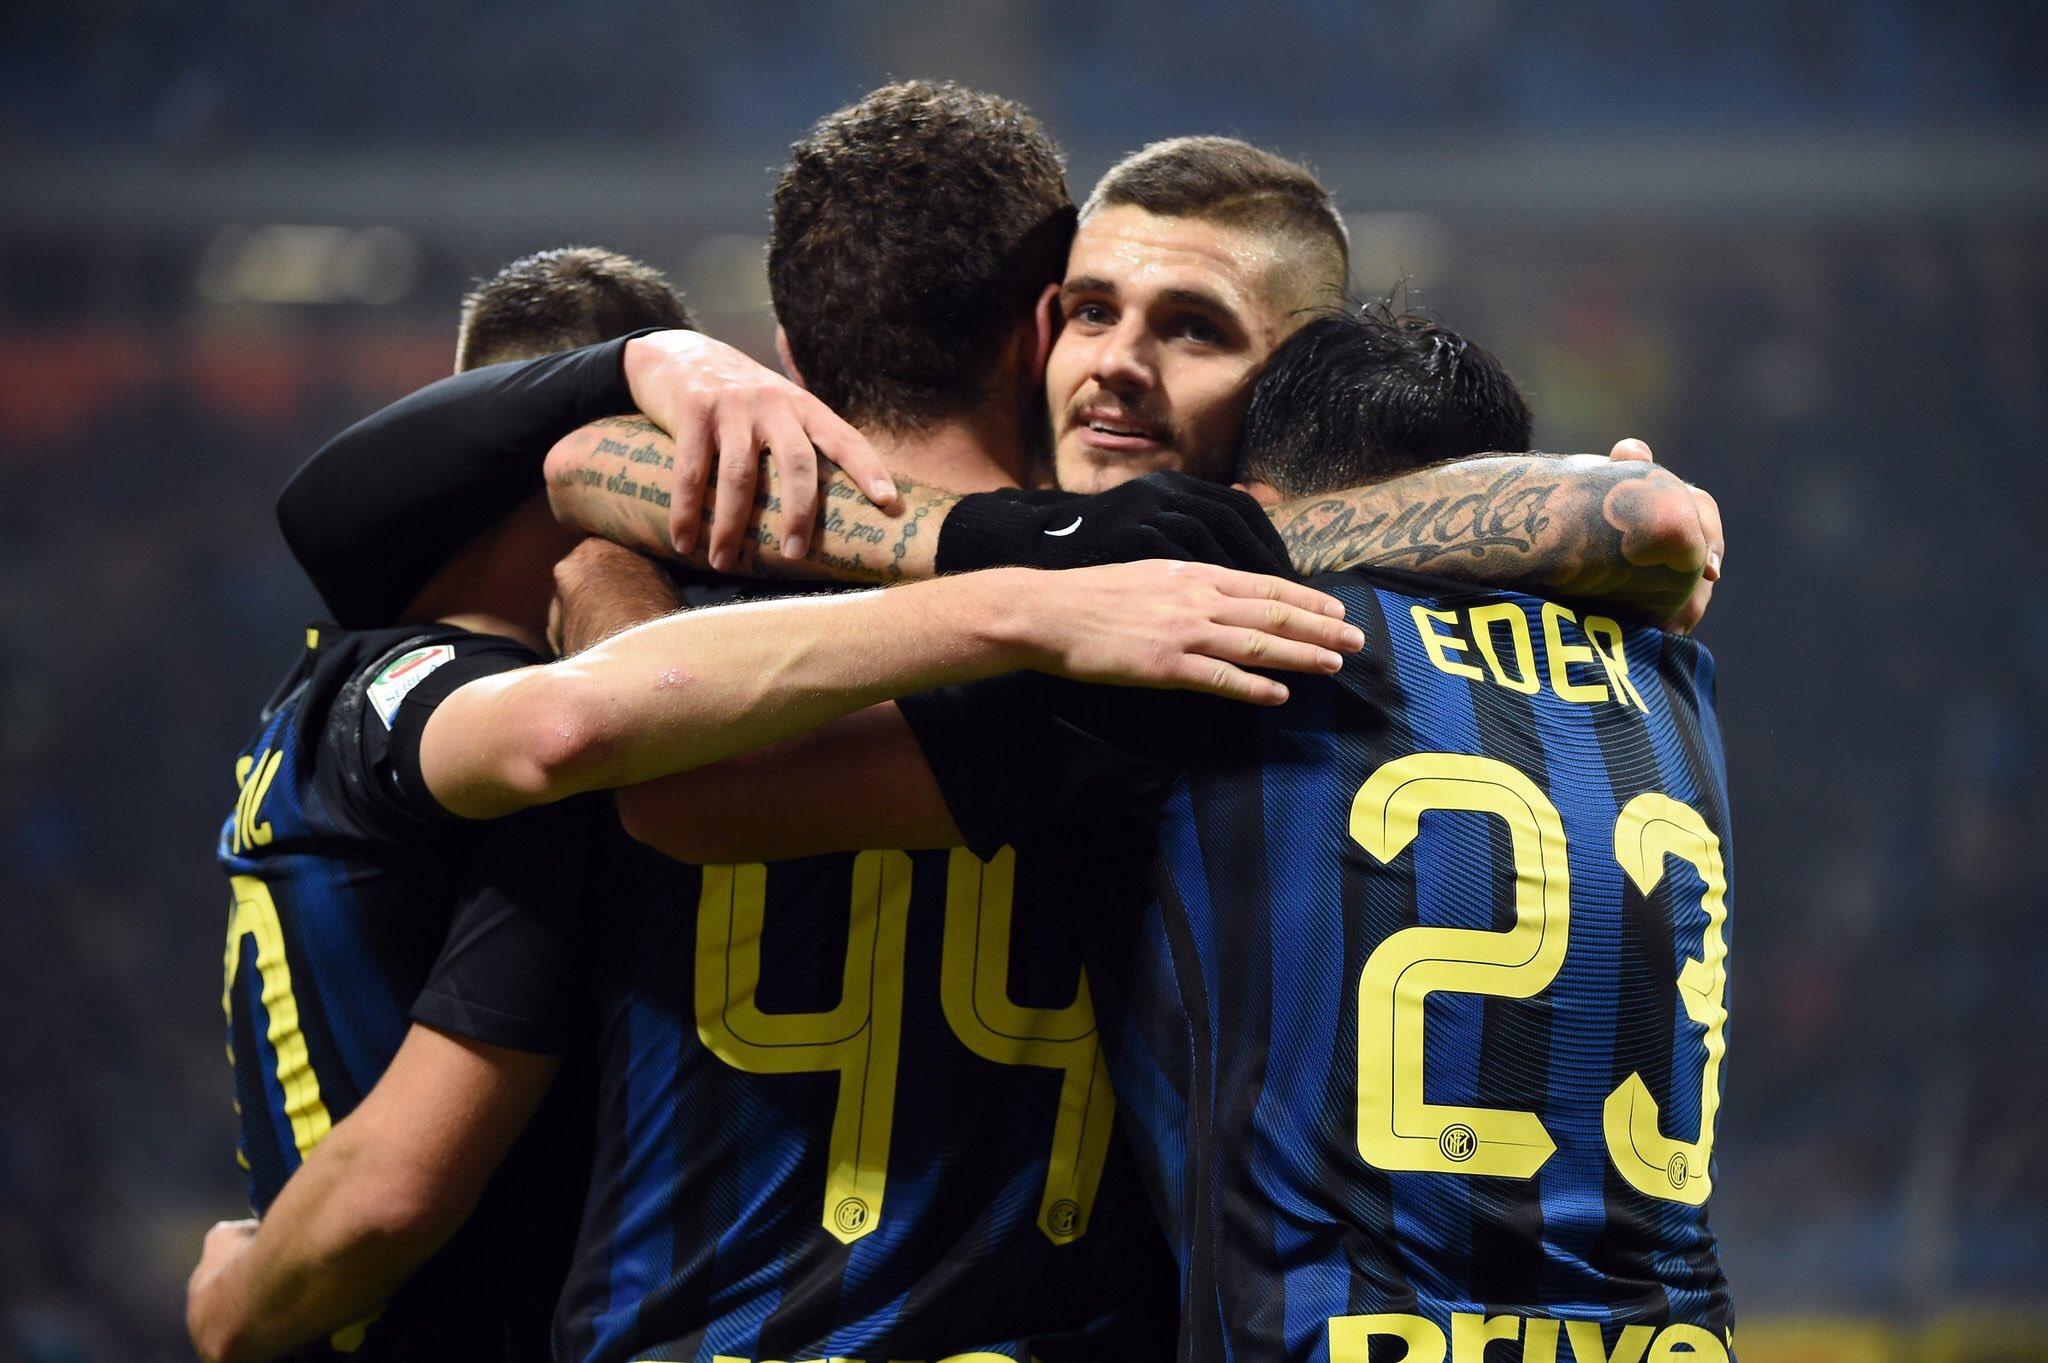 Diretta Inter-Pescara dove vedere in tv streaming gratis